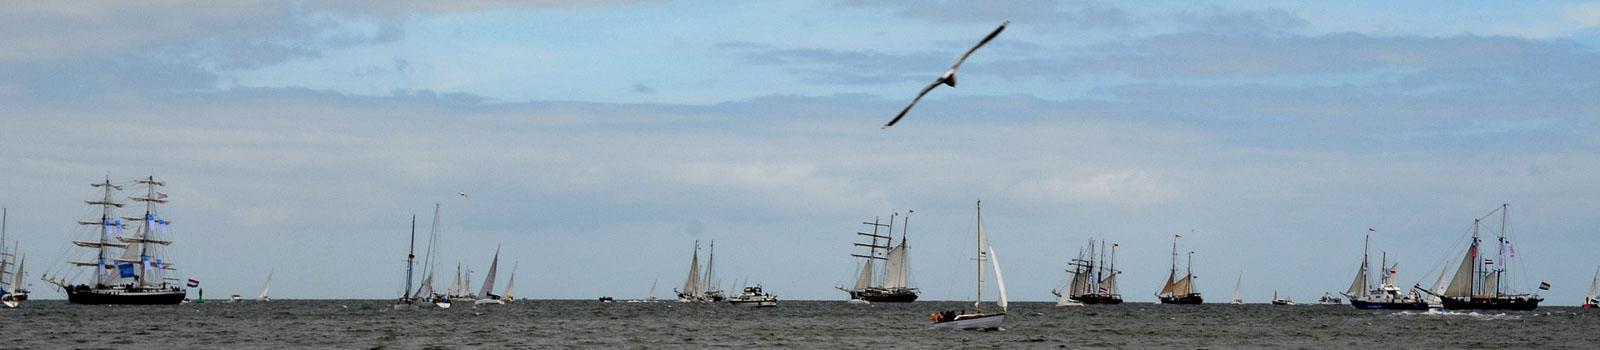 Bild aus Kiel zeigt Windjammer Parade